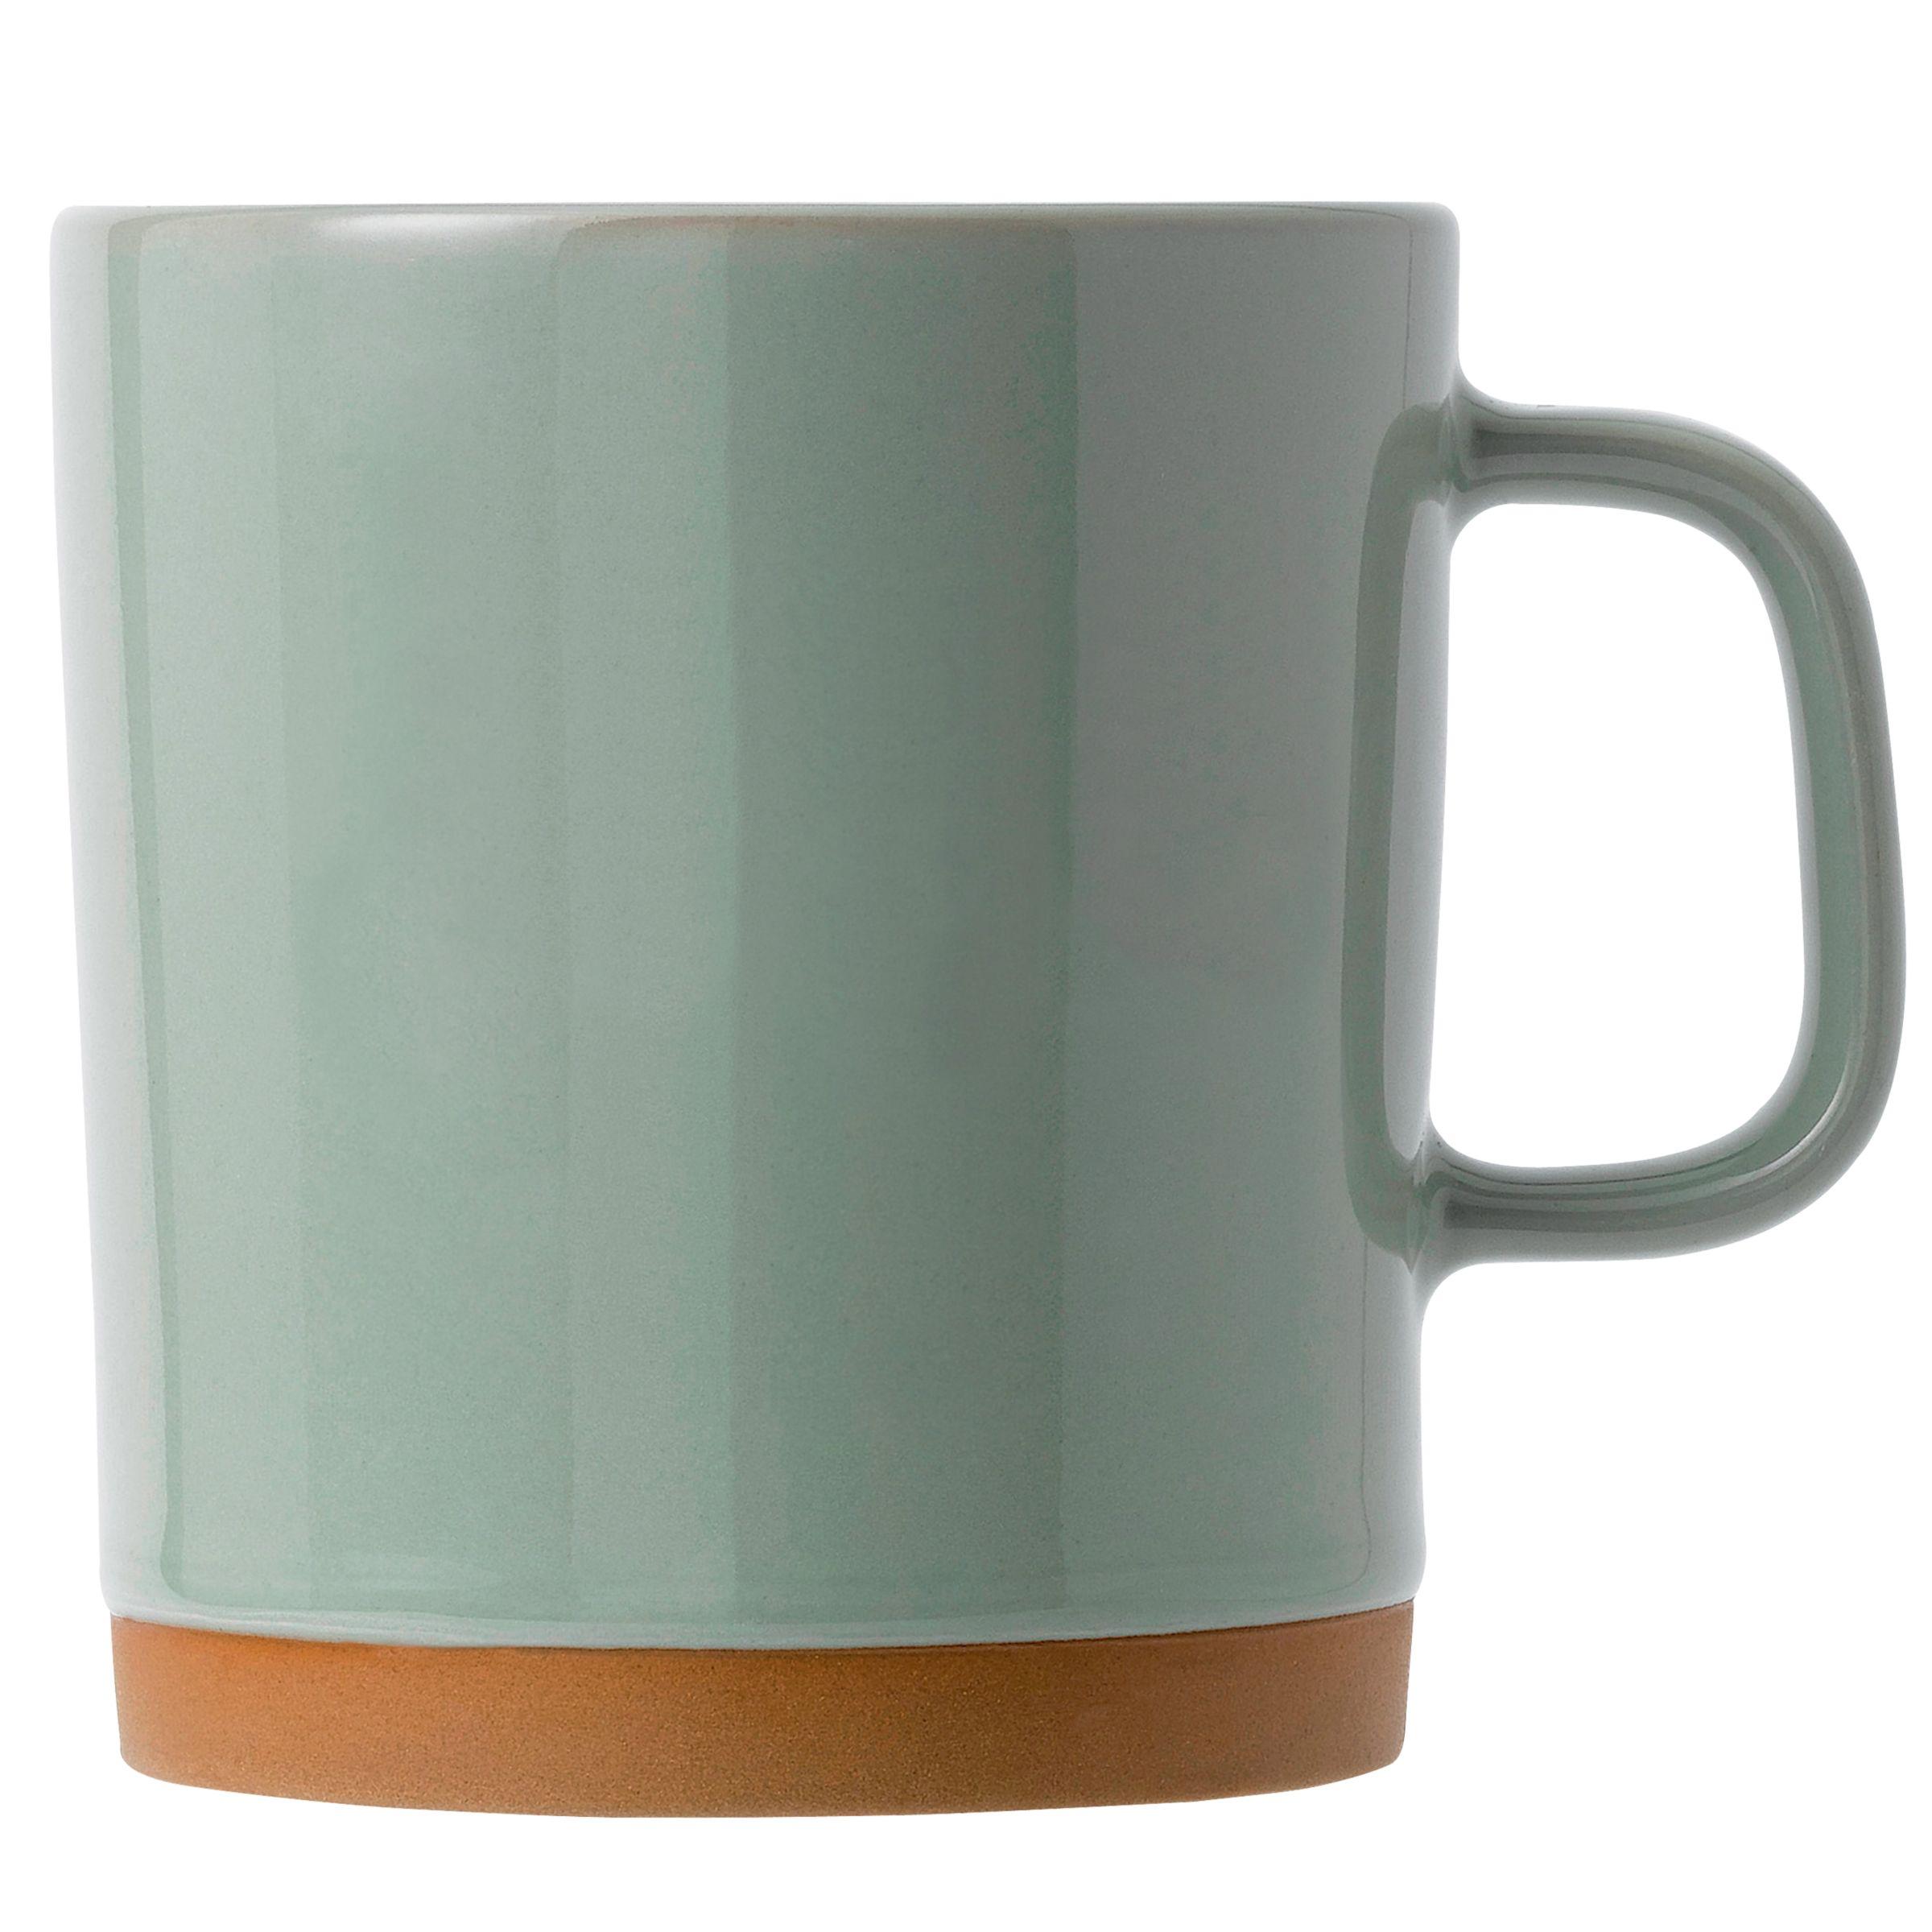 Royal Doulton Royal Doulton Olio Mug